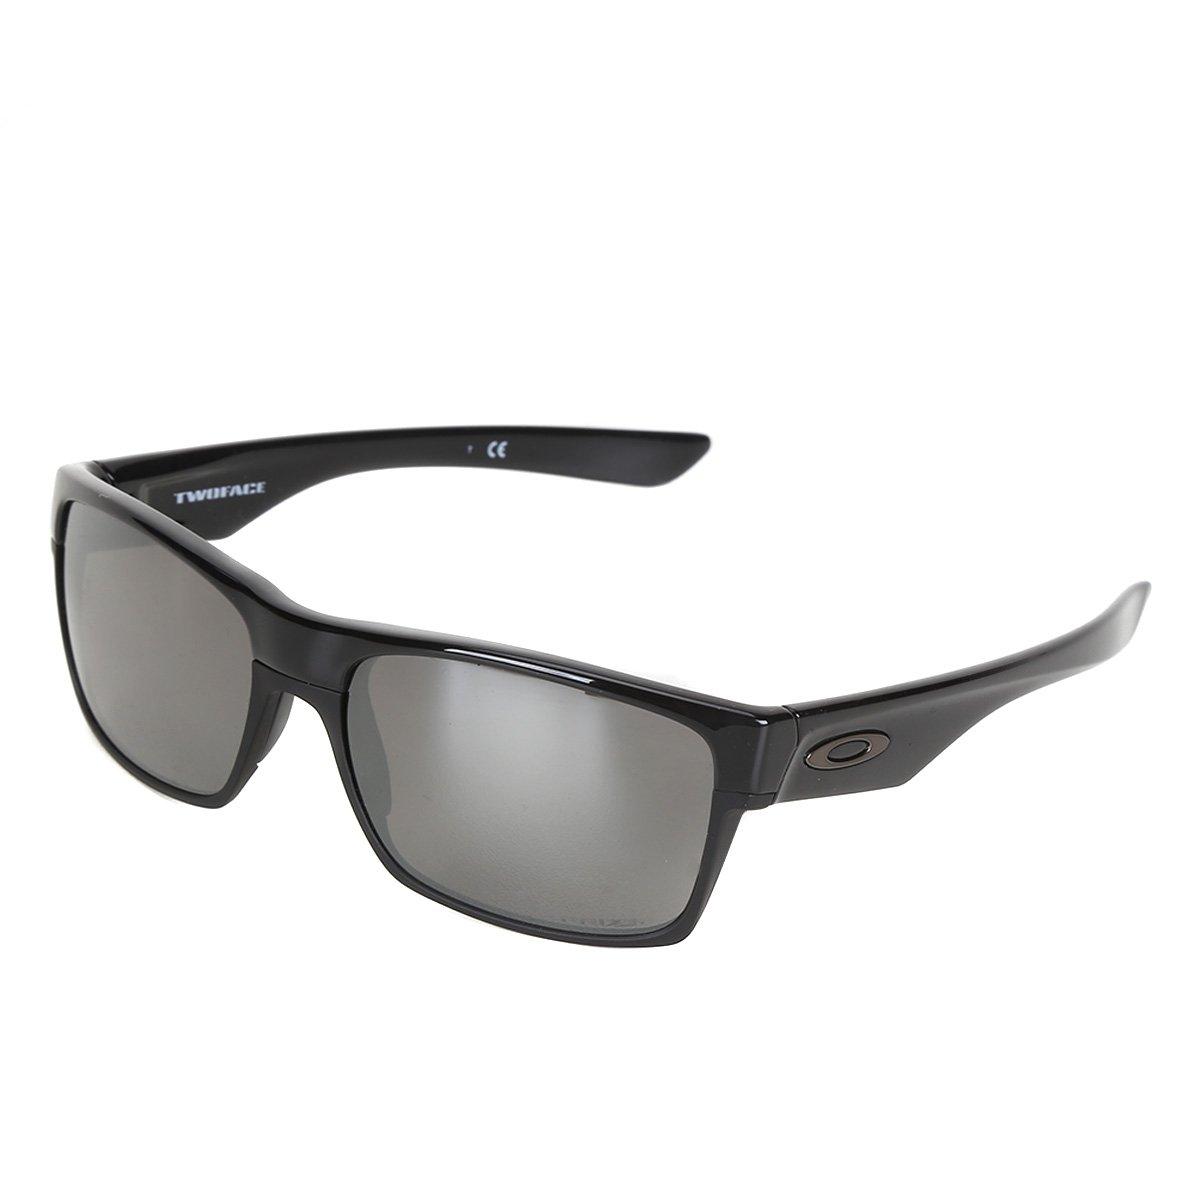 Oculos Masculino Oakley « One More Soul d756b30eda